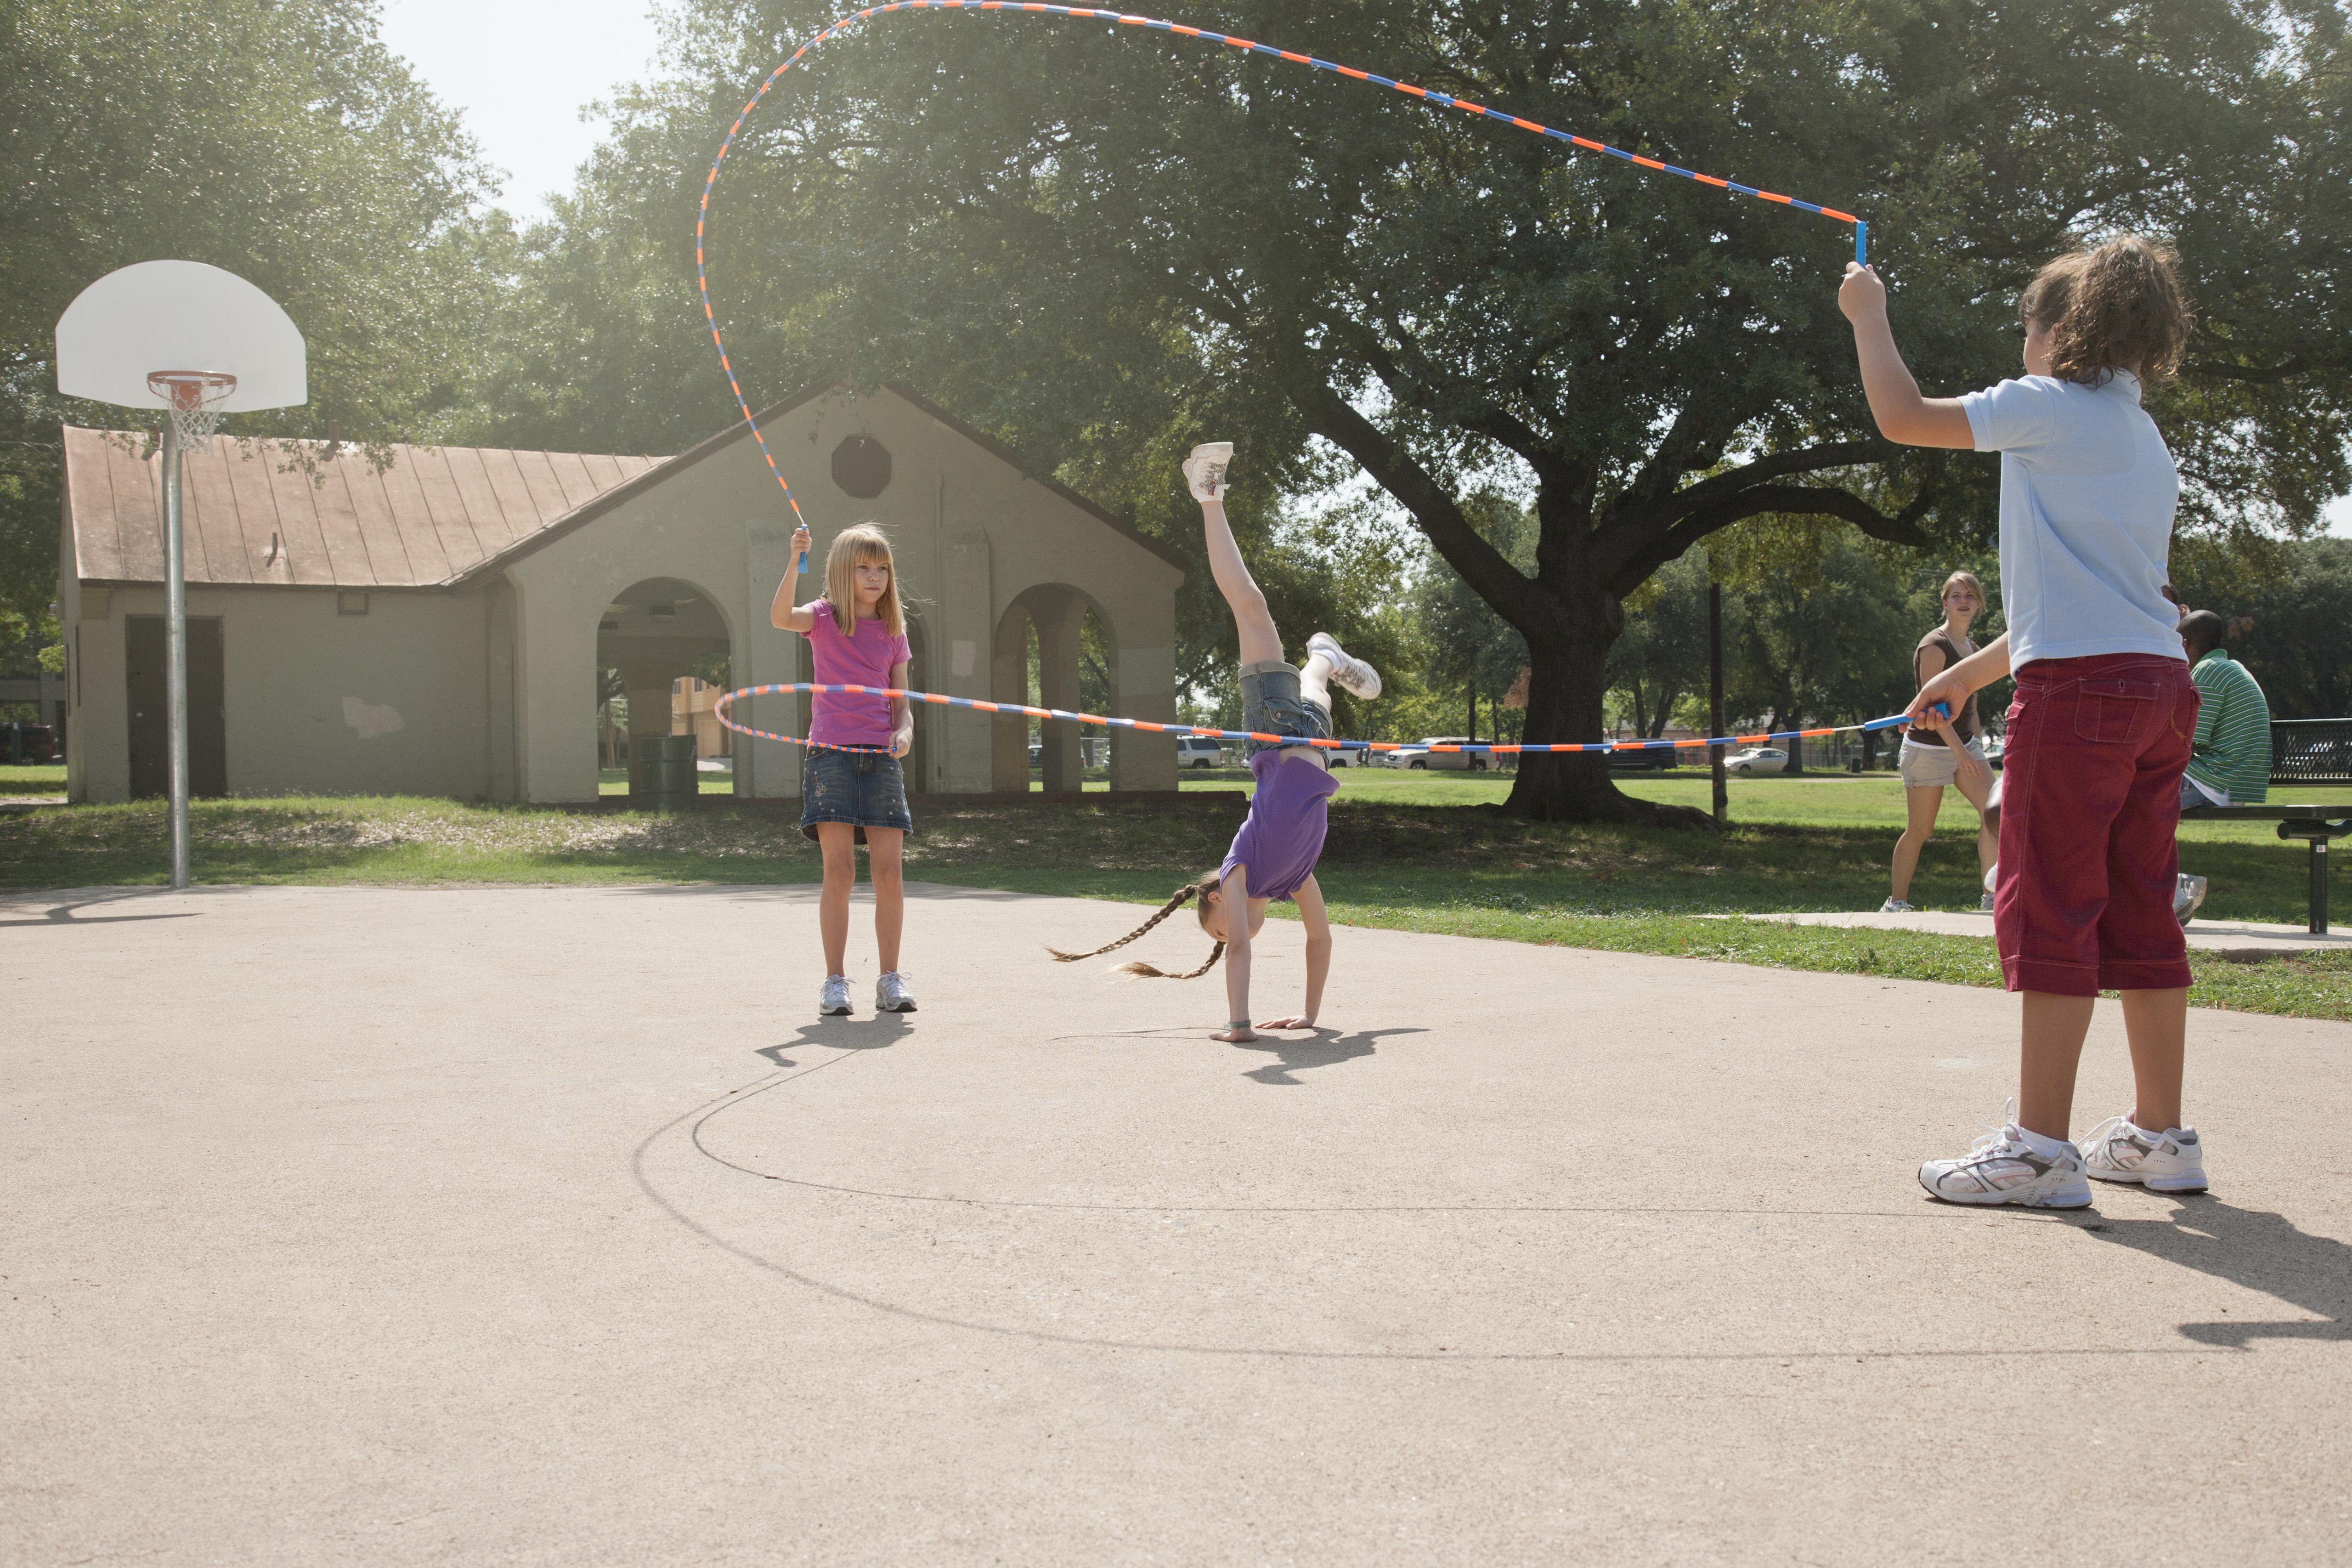 kids doing double dutch jump rope